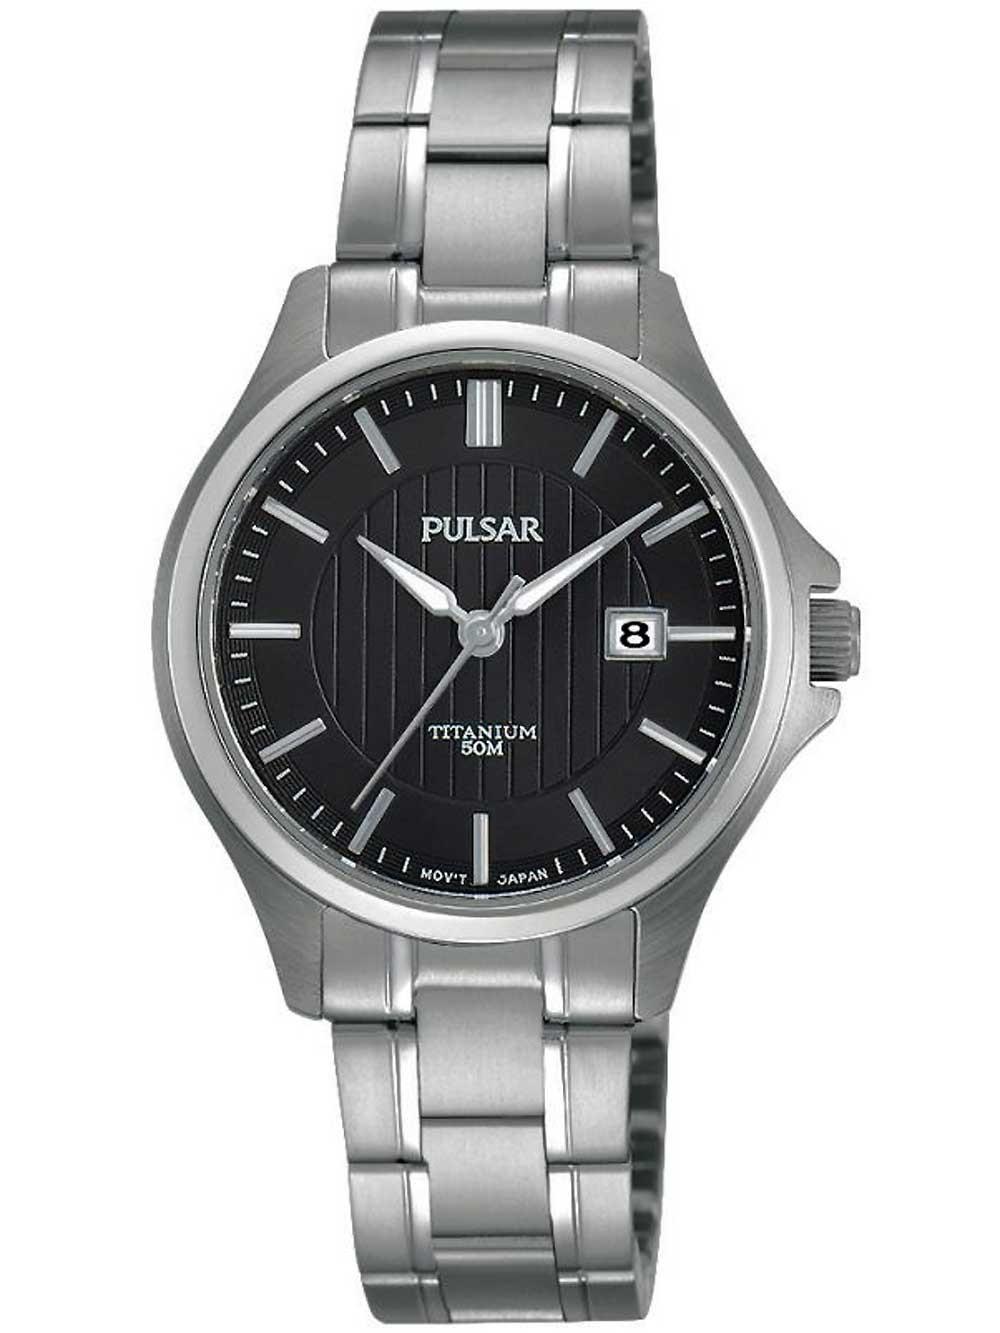 ceas de dama pulsar ph7437x1 titan 30mm 5atm